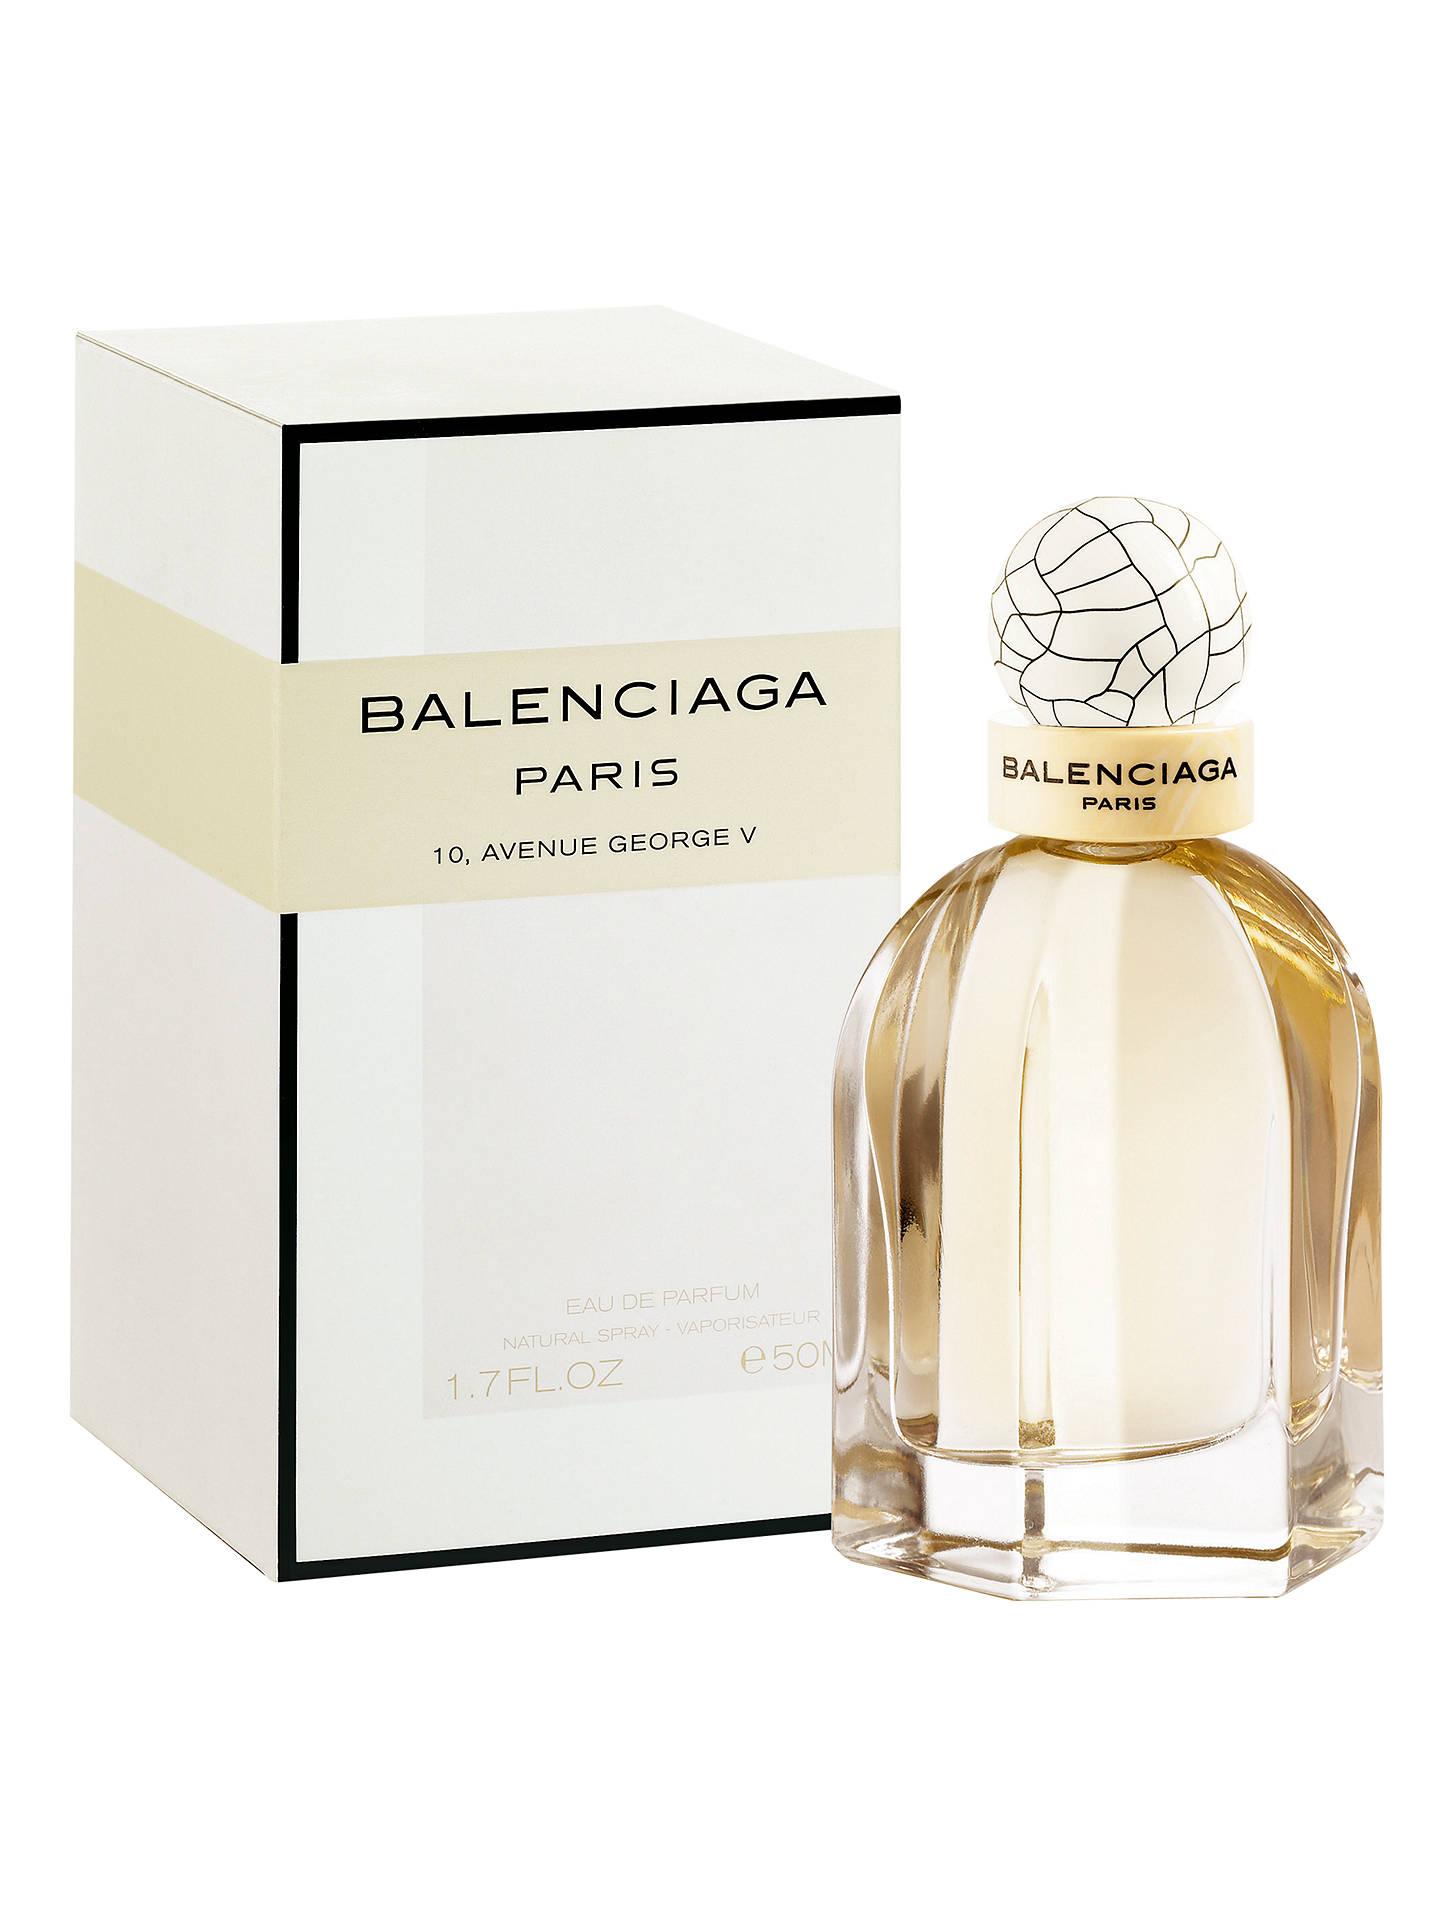 Parfum Partners Eau John Lewisamp; Balenciaga De Paris At N80mnvw